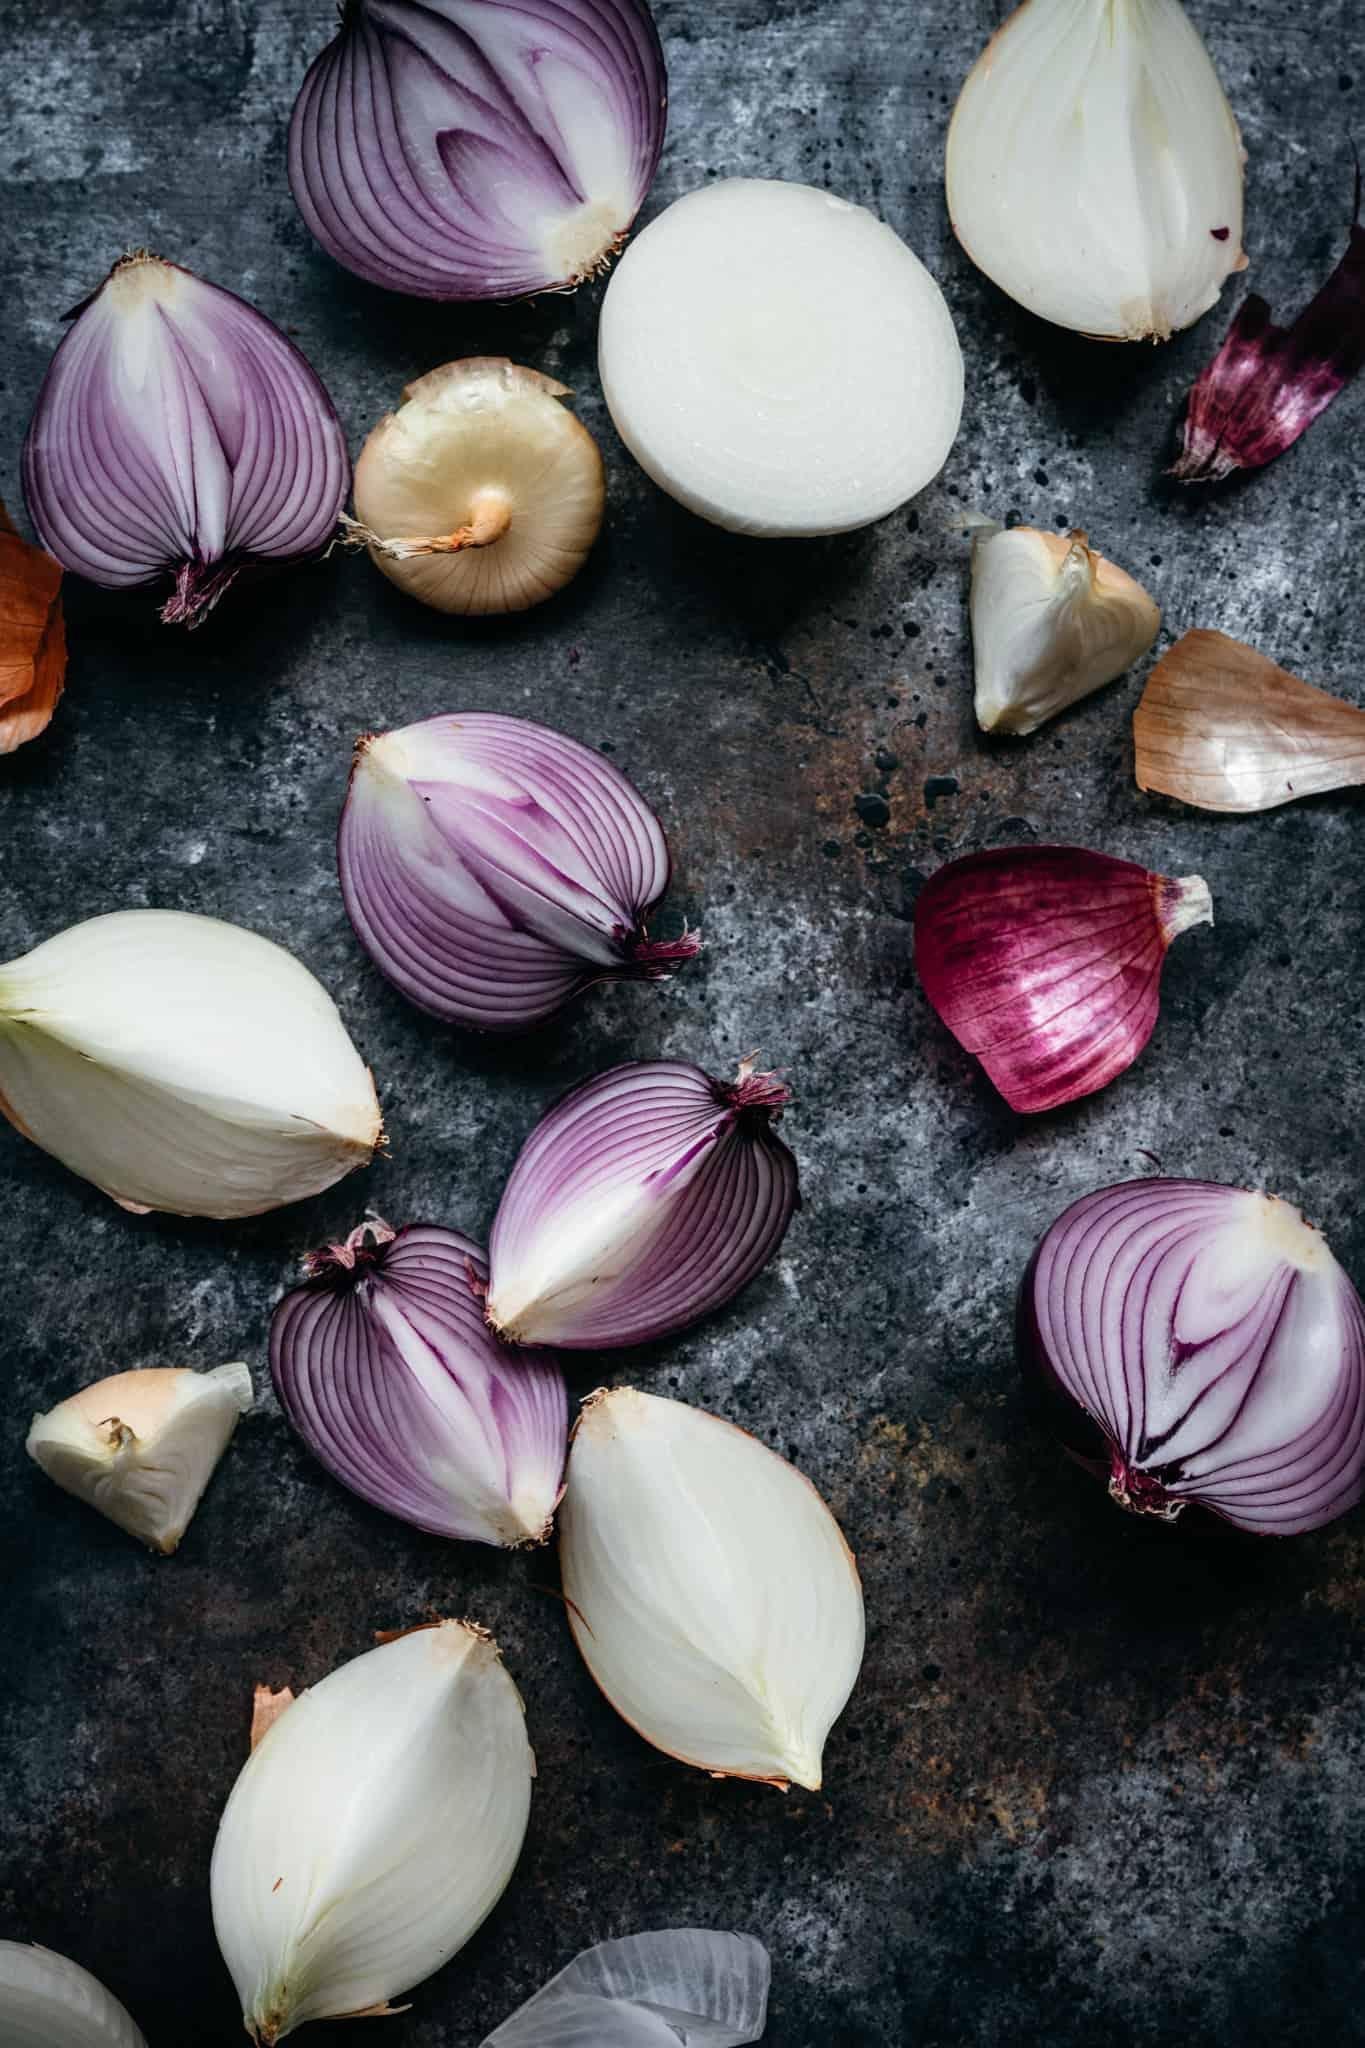 overhead of fresh purple onions chopped on a black background